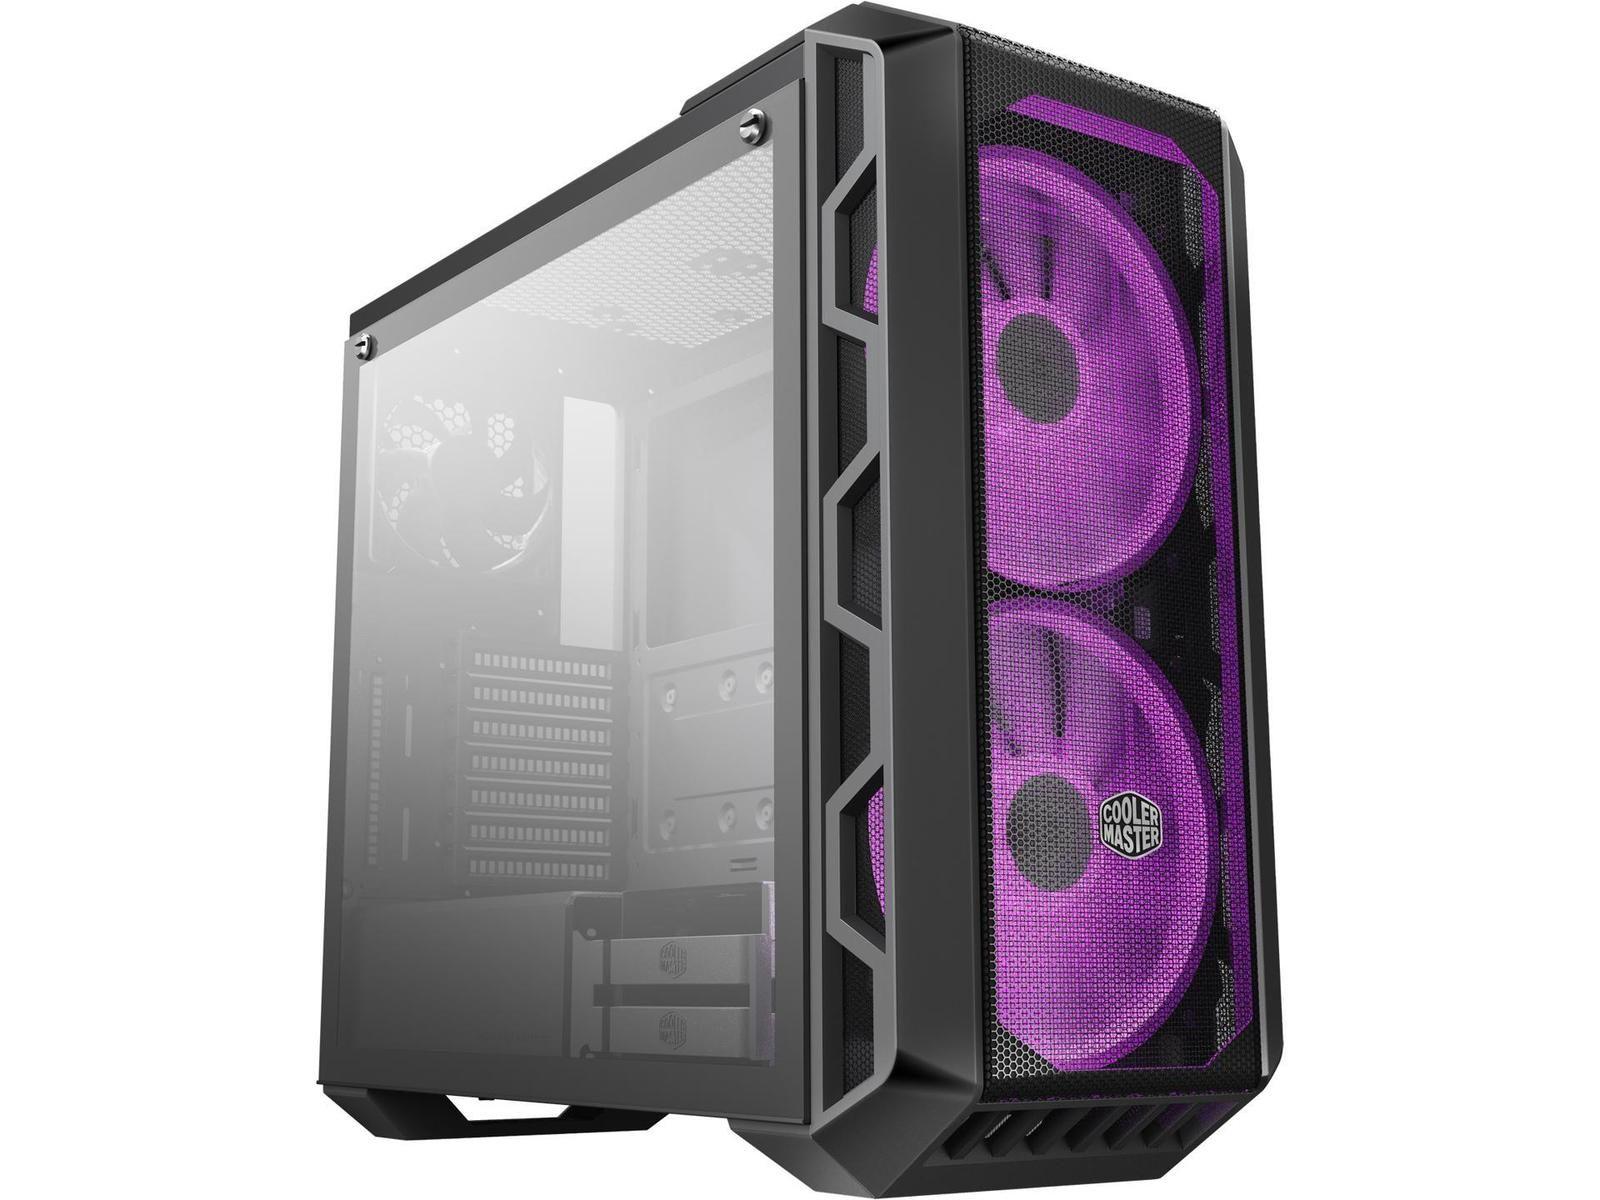 Cooler Master Masterbox Lite 5 Rgb Computer Case Atx Micro Atx Mini Itx Includes 3 X 120mm Rgb Fans Tempered Computer Case Cooler Master Best Gaming Setup